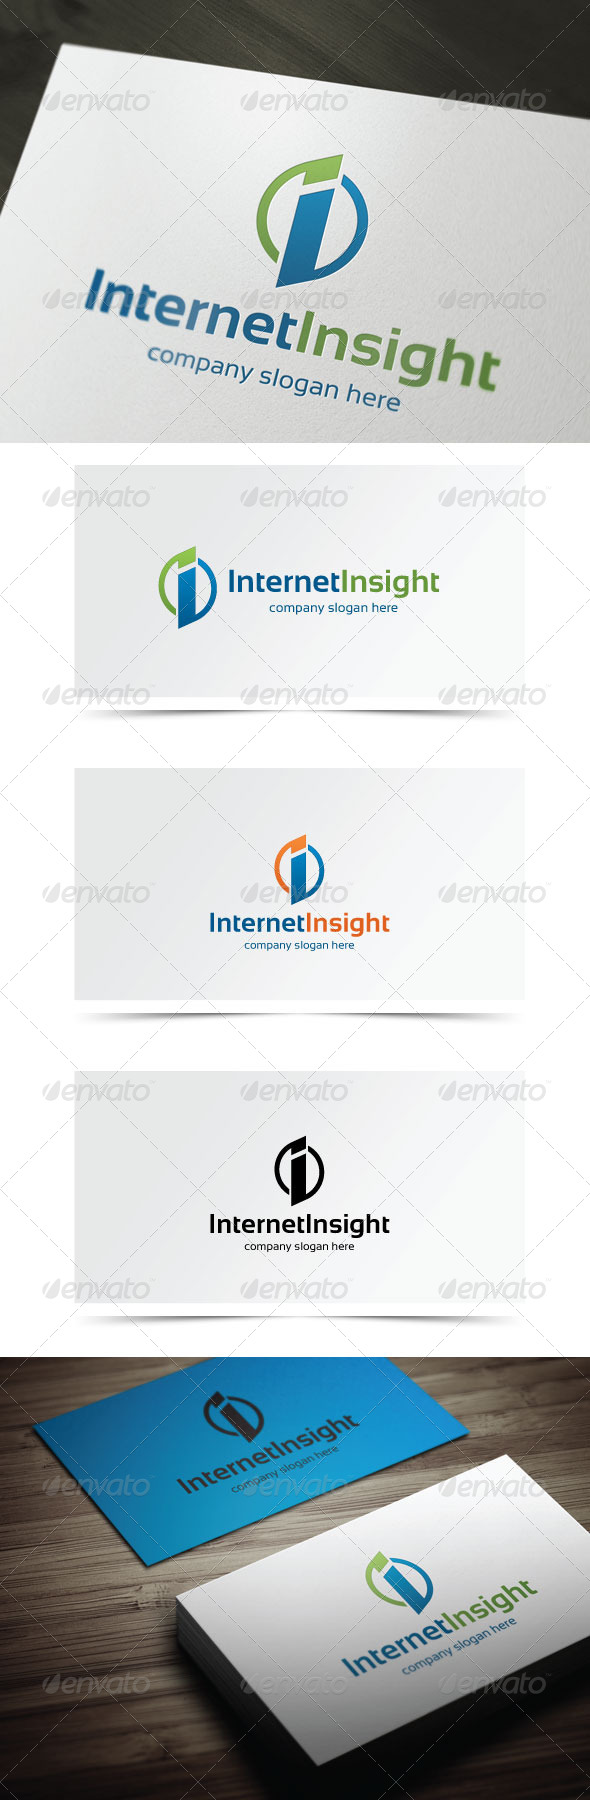 GraphicRiver Internet Insight 5939425